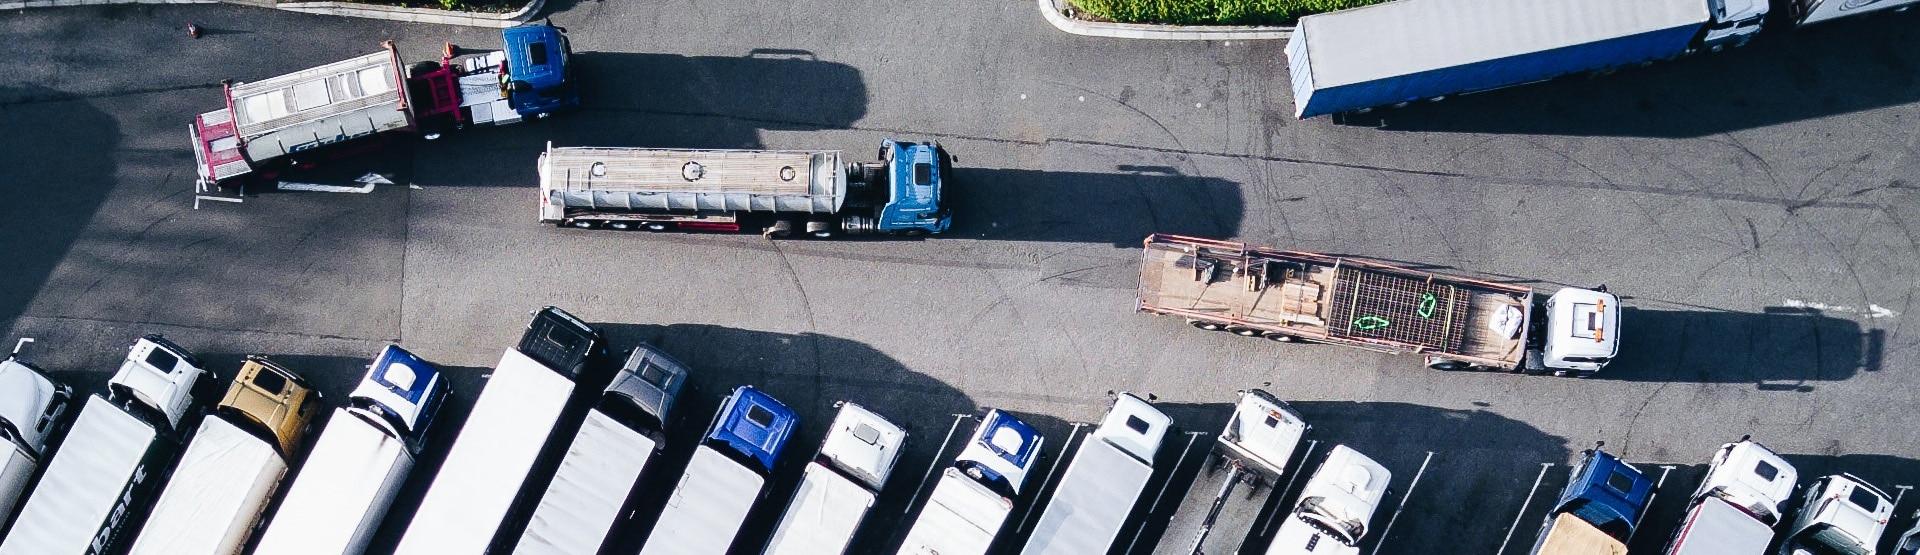 shipping-banner-1.jpg